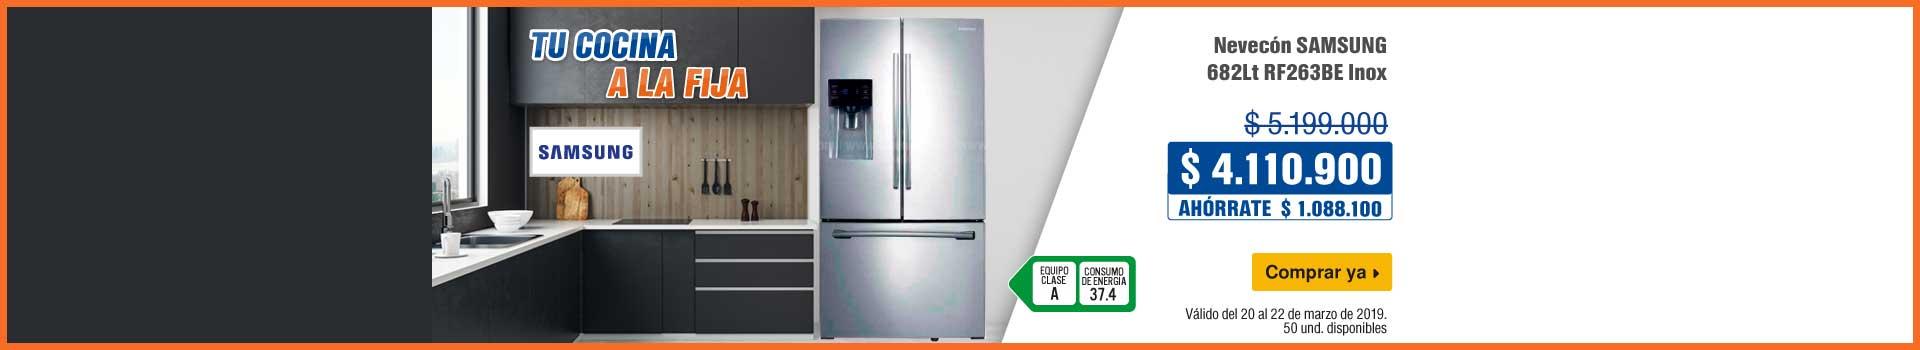 AK-KT-mayores-2-ELECT-BCAT-refrigeracion-samsung-200319